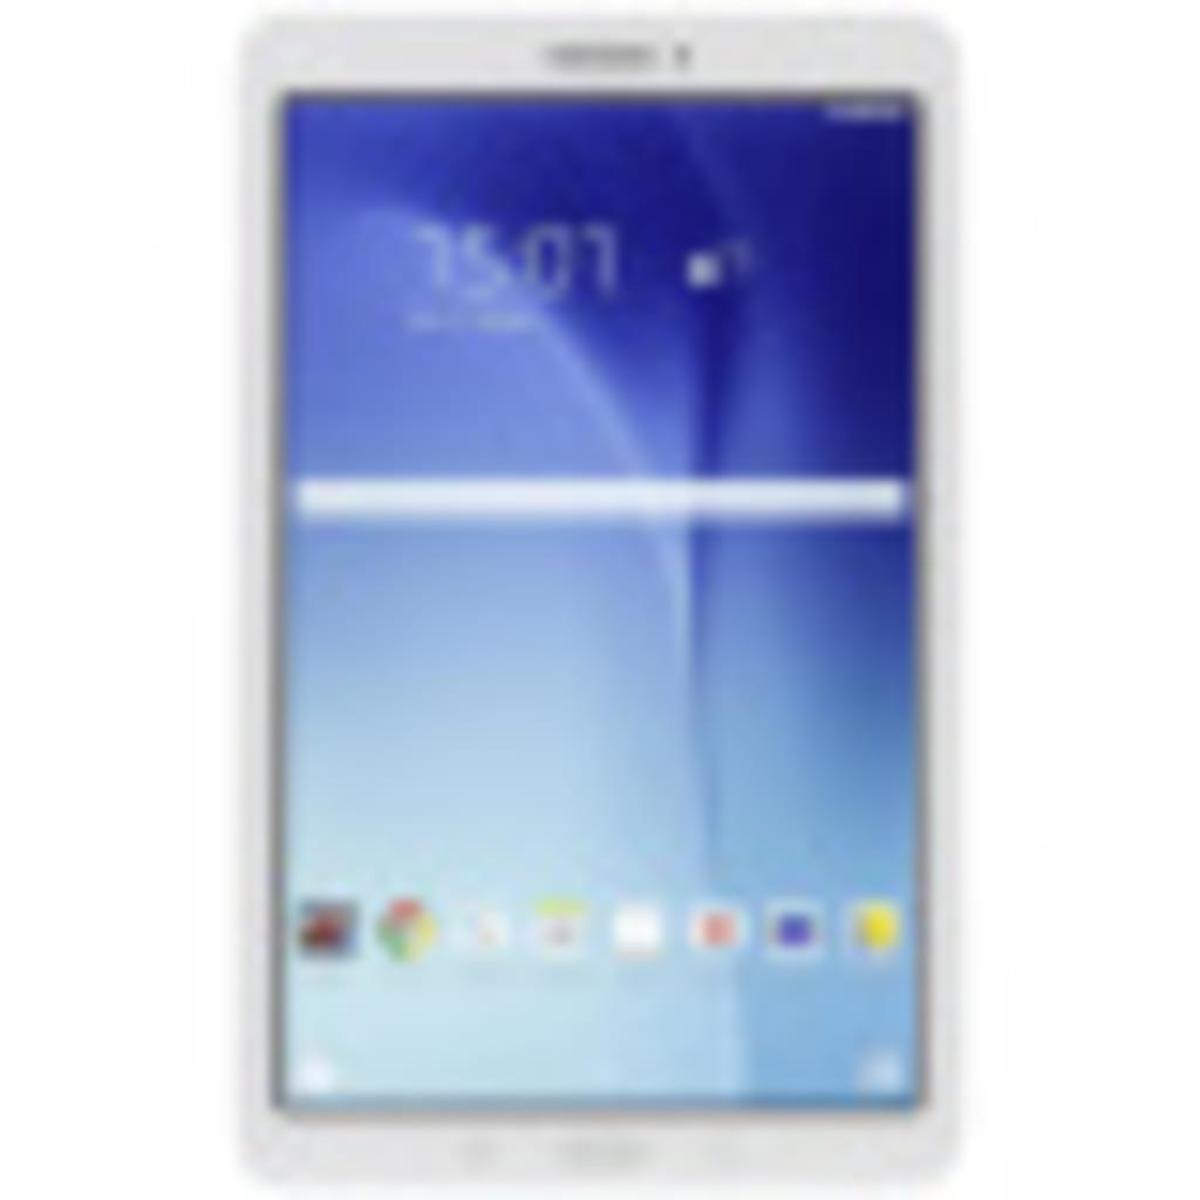 Bild 5 von Samsung Galaxy Tab E SM-T560 Tablet-PC - 24,4 cm (9,6 Zoll)